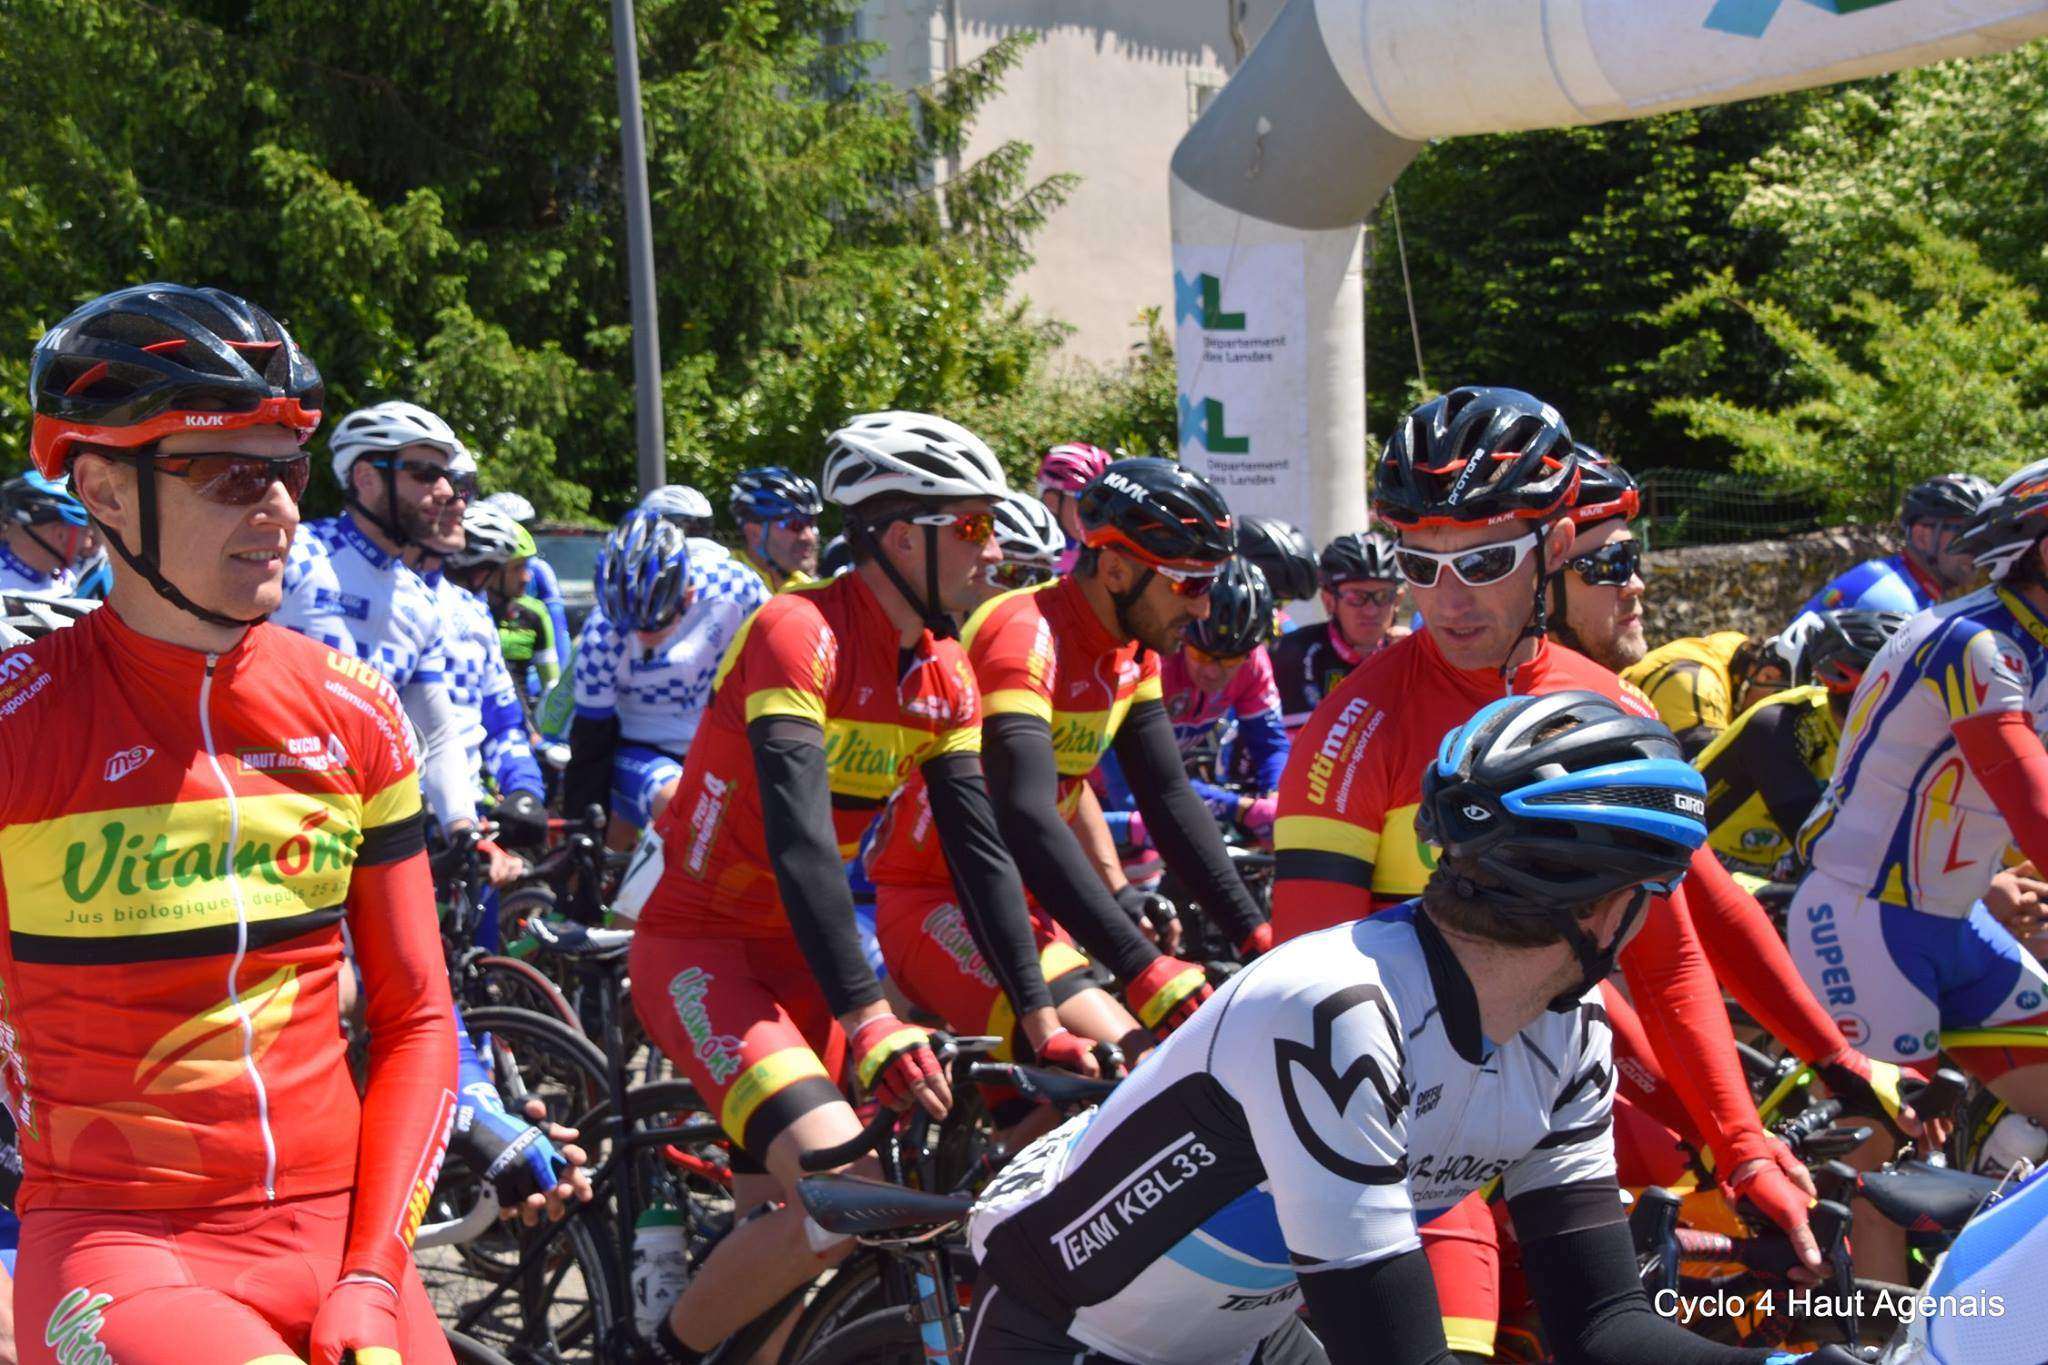 2018-05-13-Tour Chalosse-41.jpg